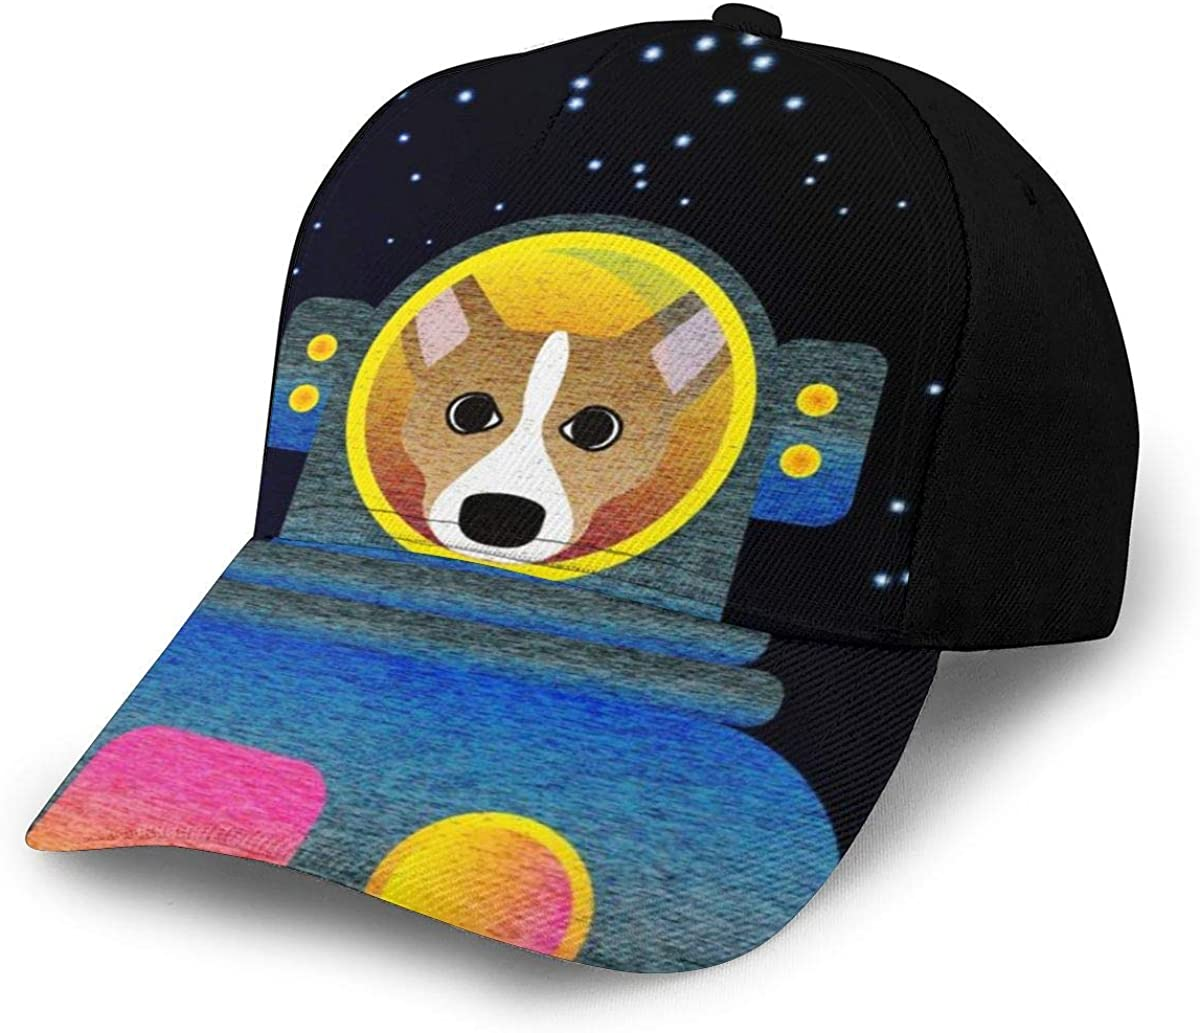 Cartoon Space Corgi Dog Classic Baseball Cap Men Women Dad Hat Twill Adjustable Size Black